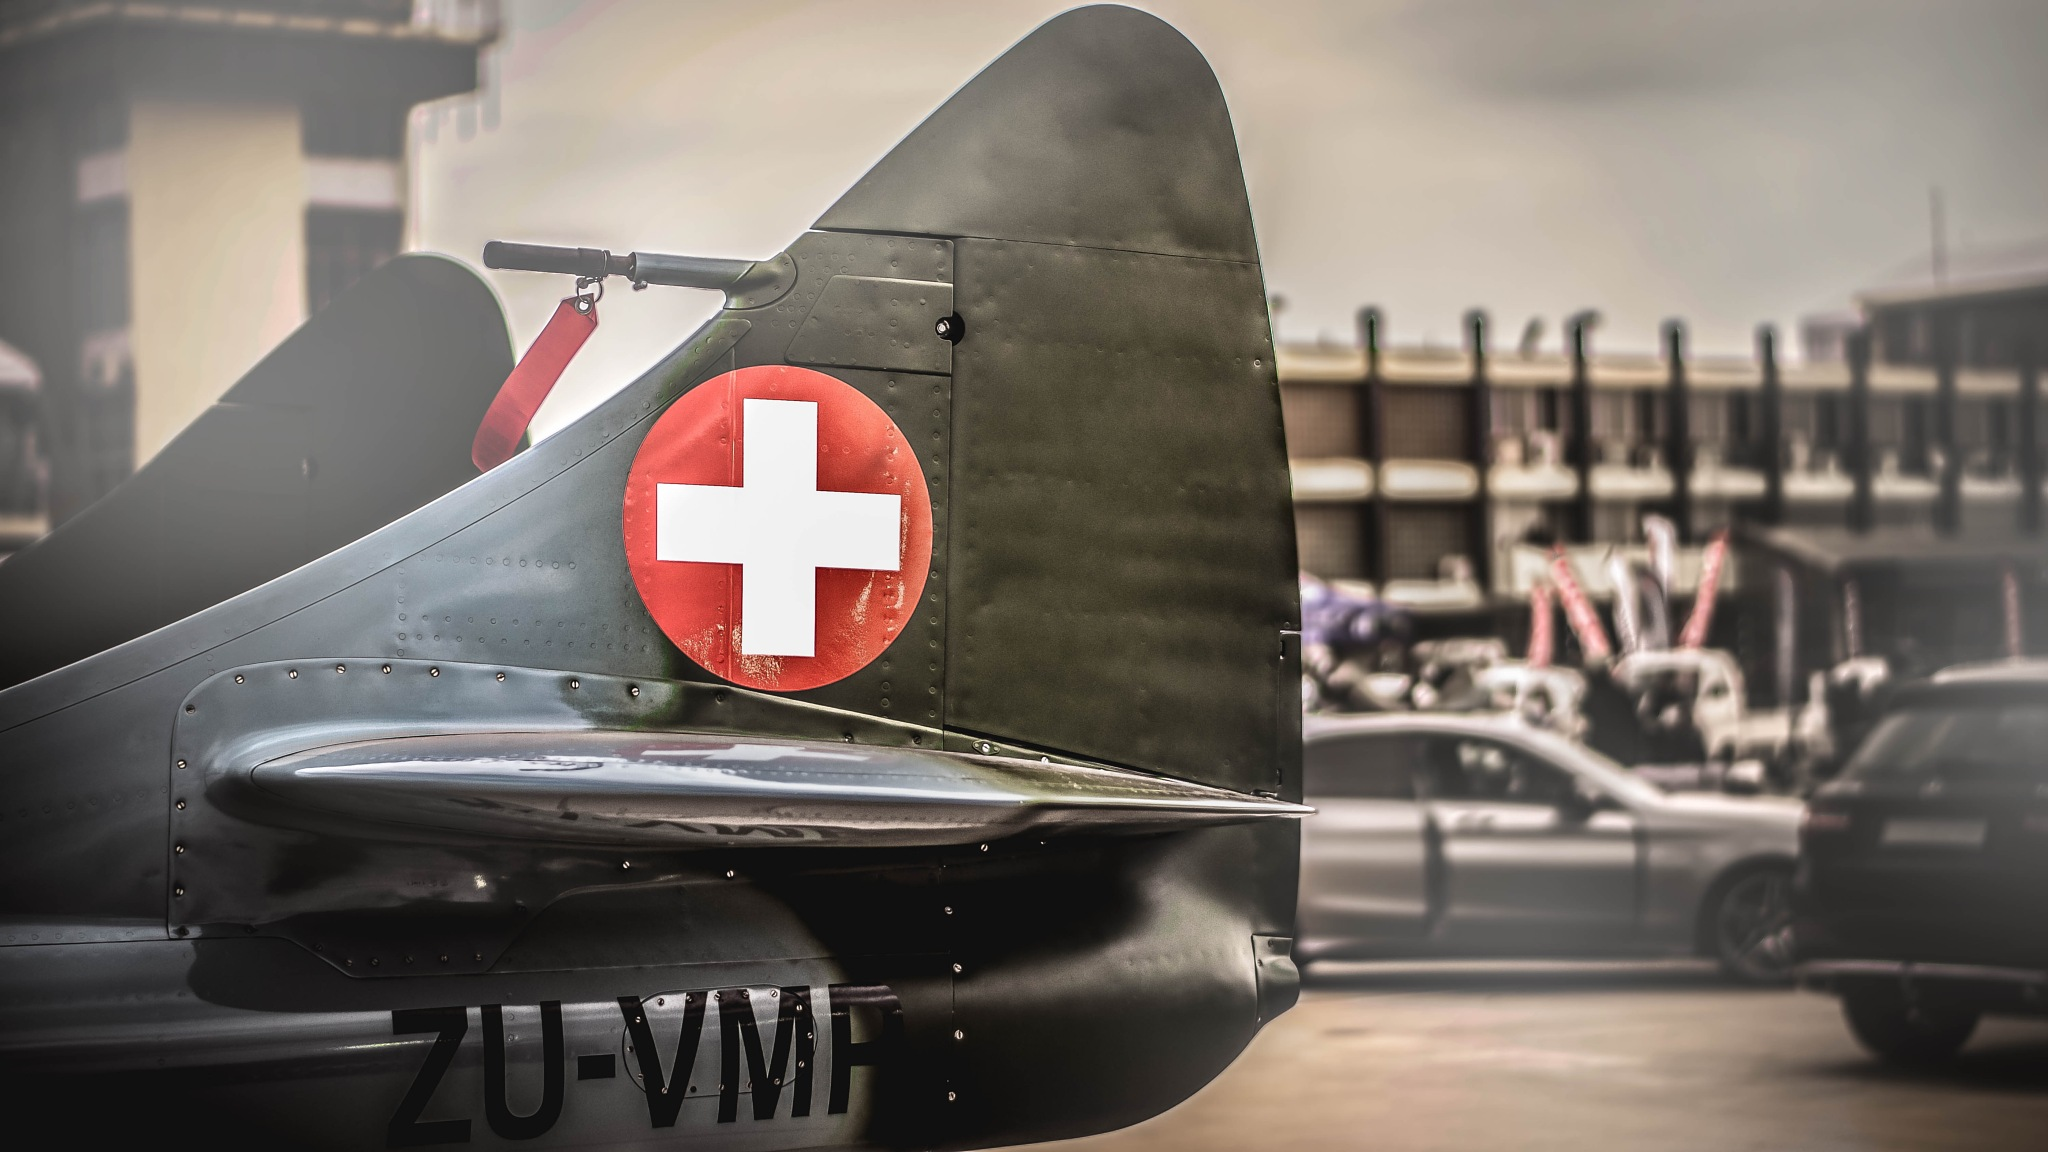 Air show by Jaco Venter